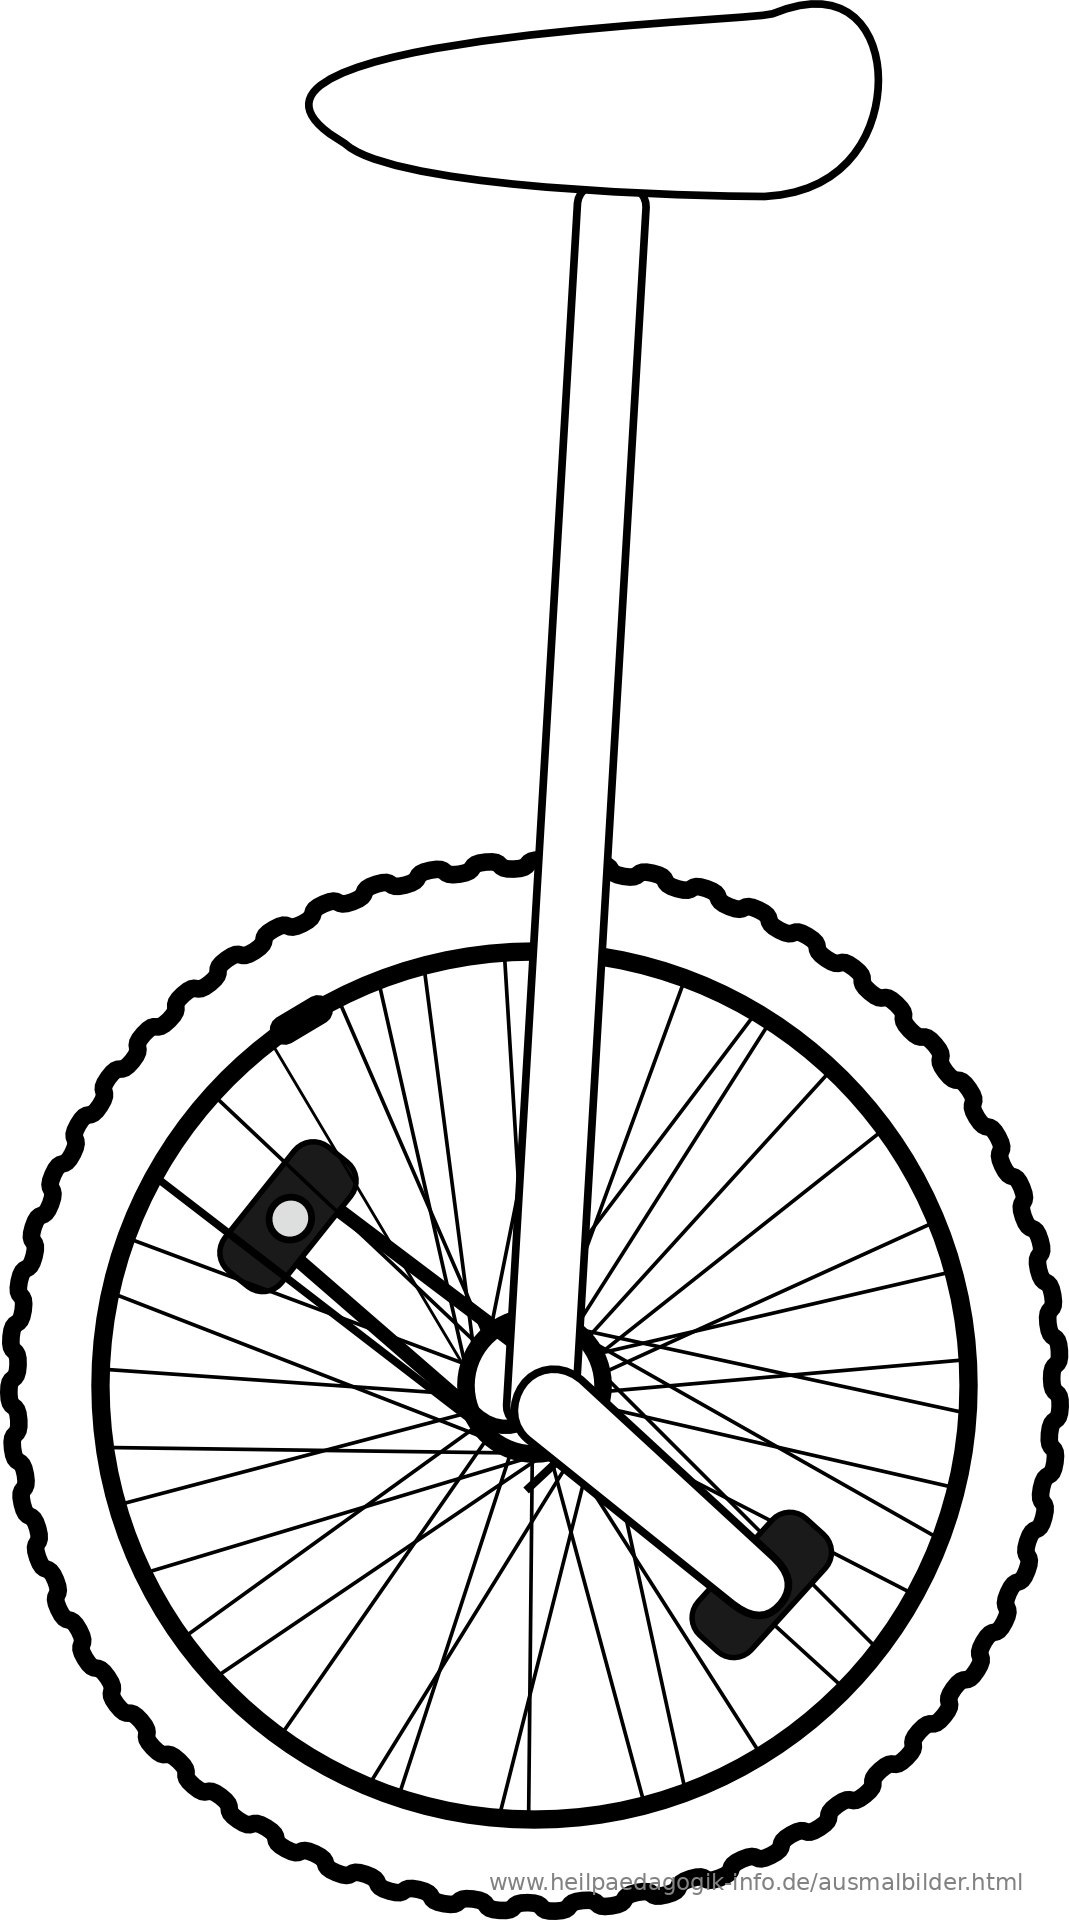 inspirierend ausmalbild fahrrad kostenlos  top kostenlos